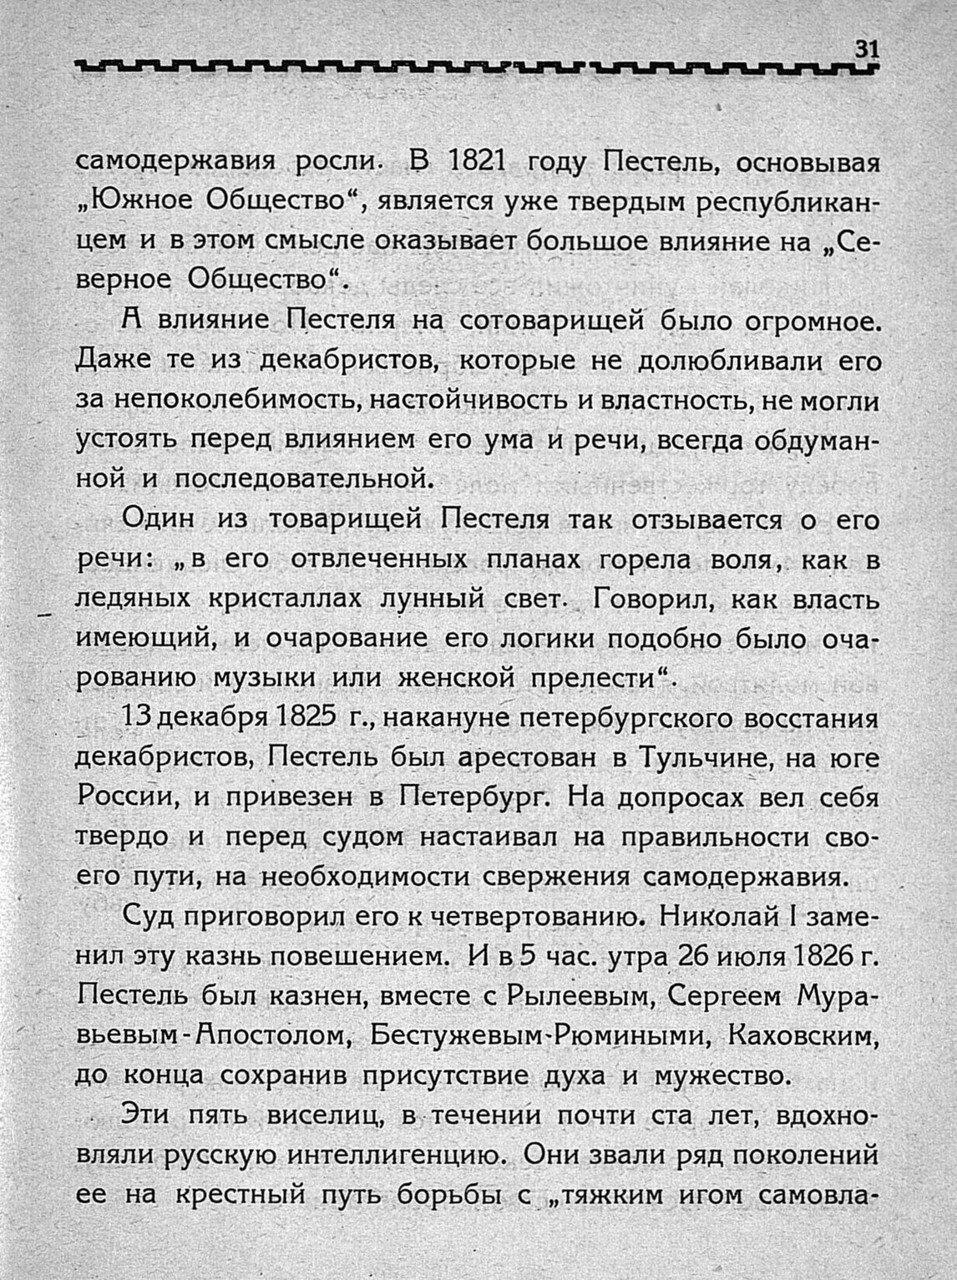 https://img-fotki.yandex.ru/get/108168/199368979.23/0_1bfae3_5ea30e86_XXXL.jpg